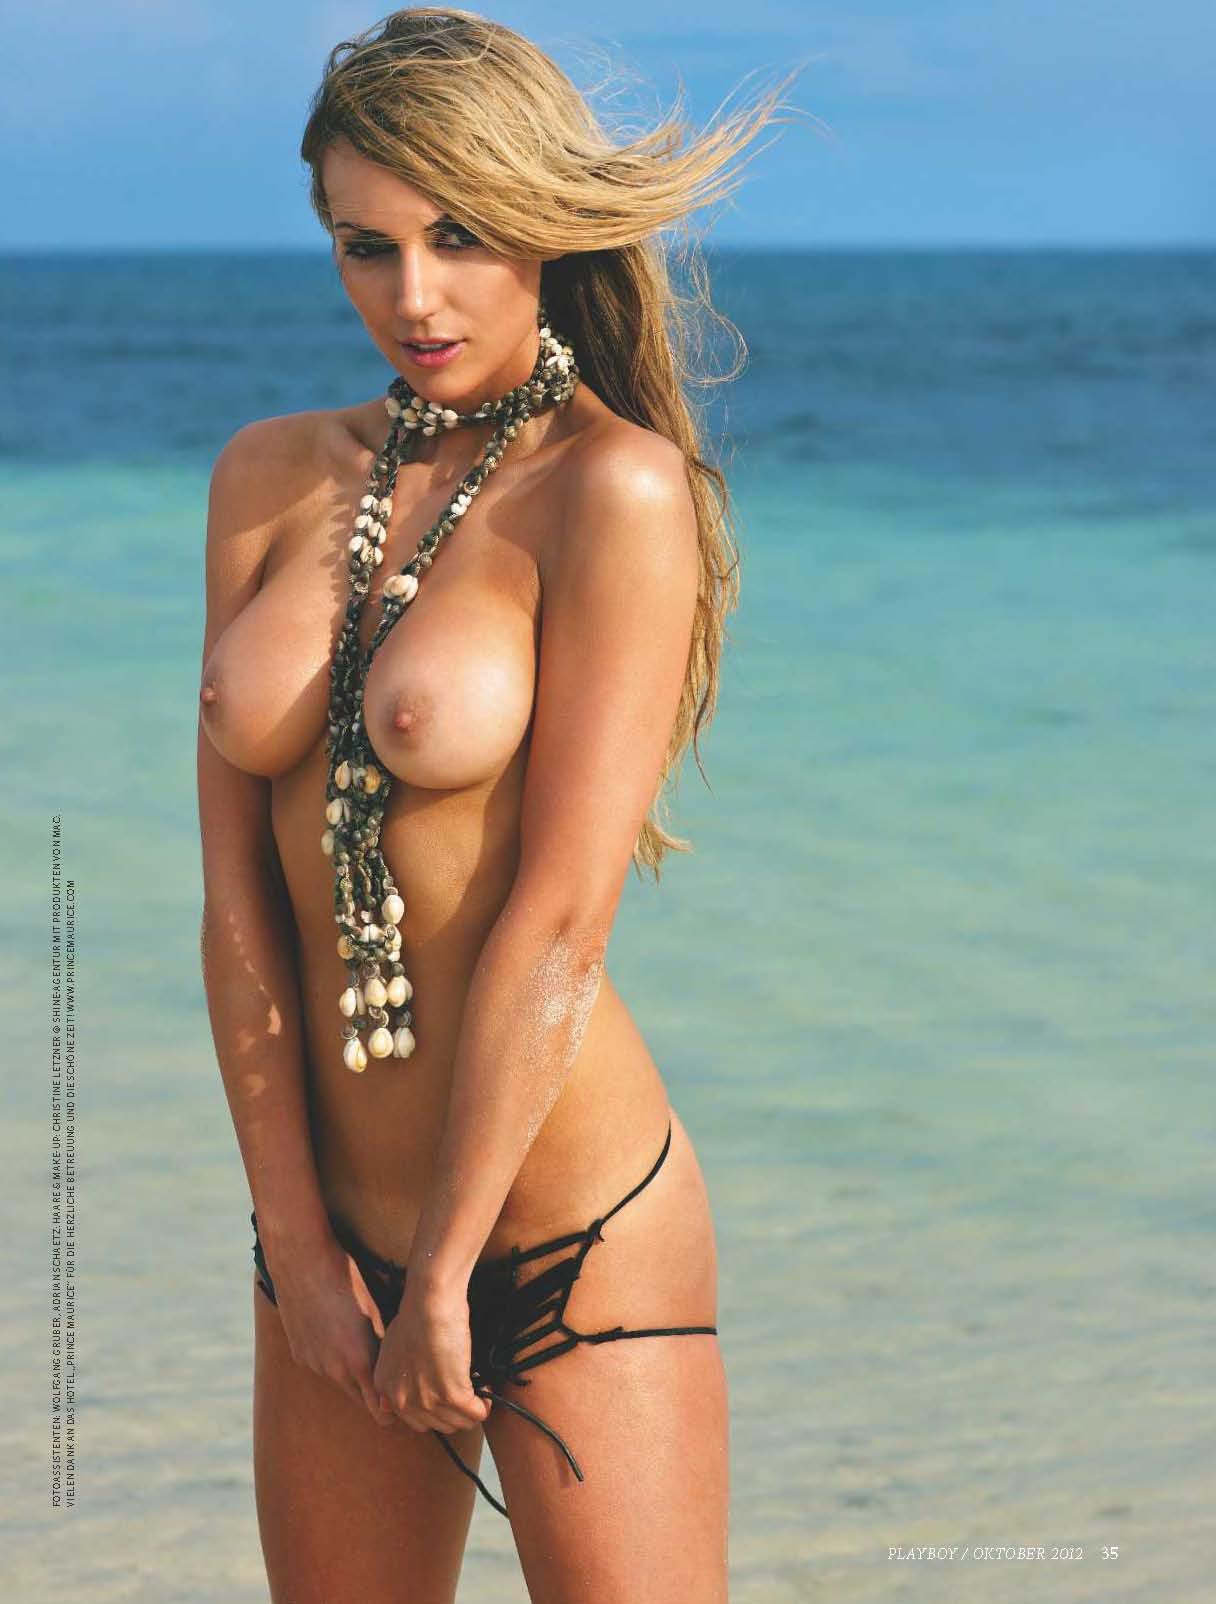 23067_septimiu29_RosannaDavison_PlayboyGermany_Oct20127_123_489lo.jpg